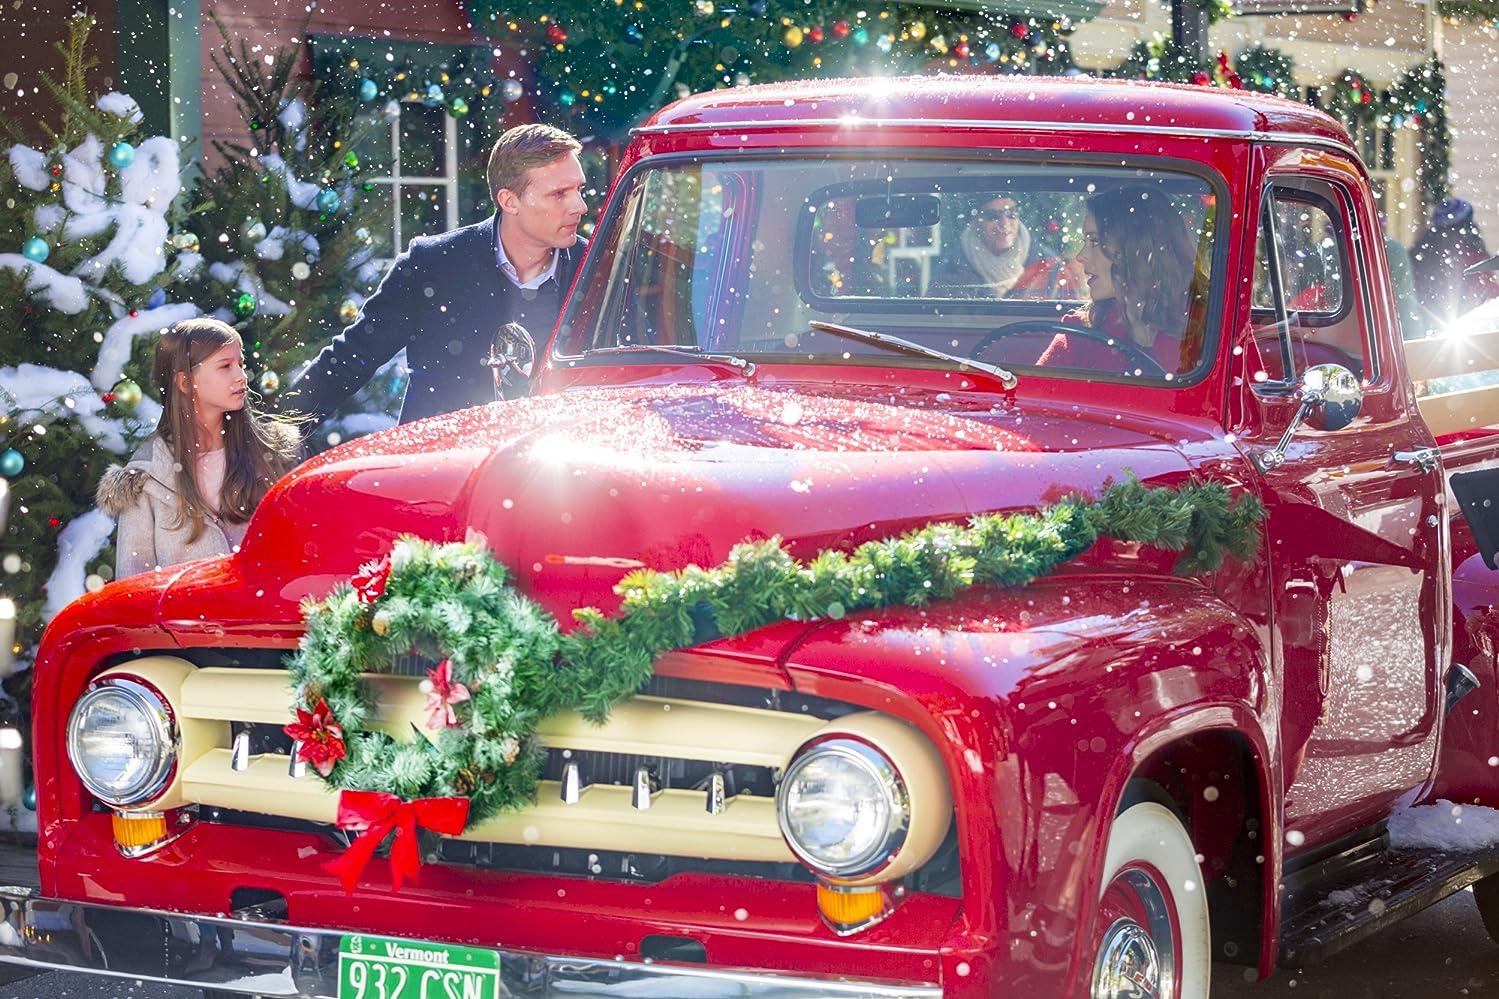 Christmas In Evergreen.Christmas In Evergreen 2017